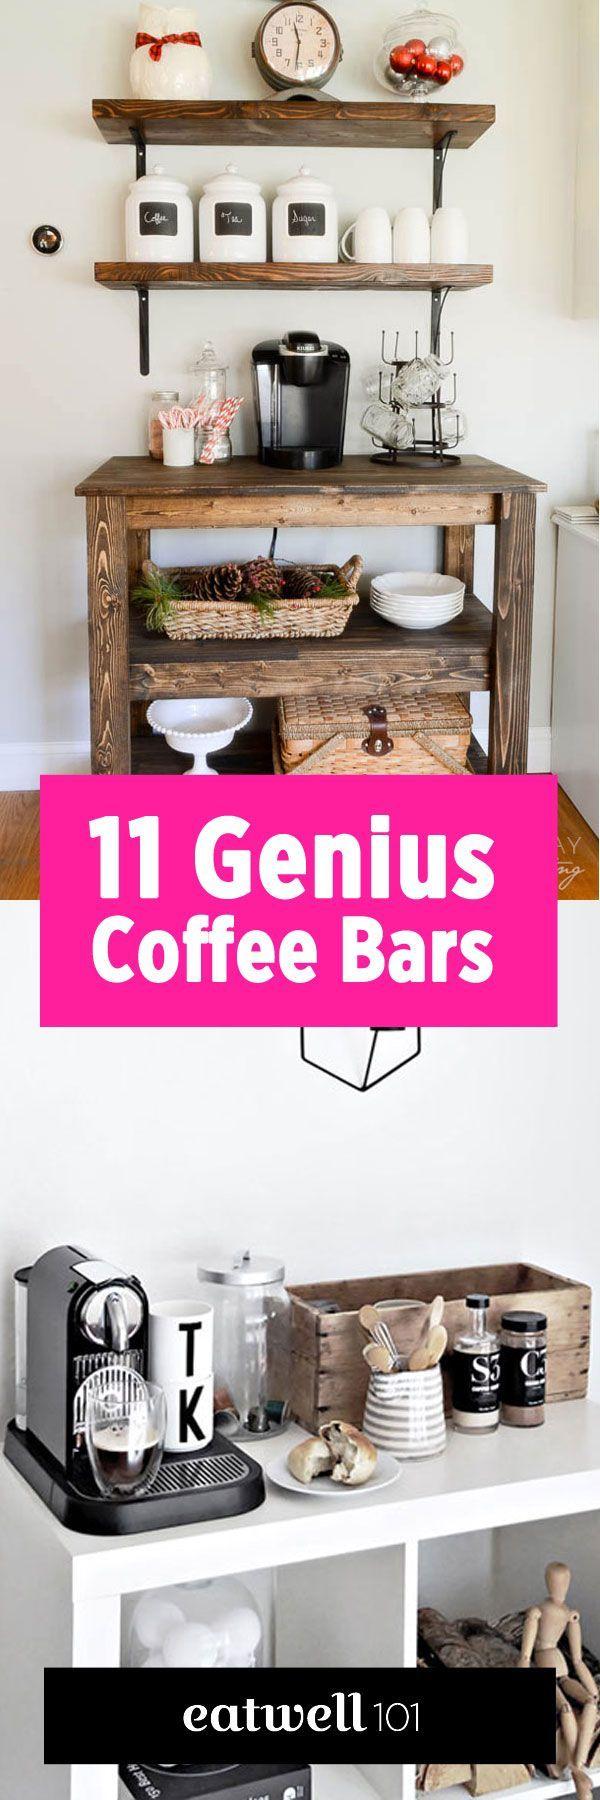 Awesome Home Coffee Bar Supplies